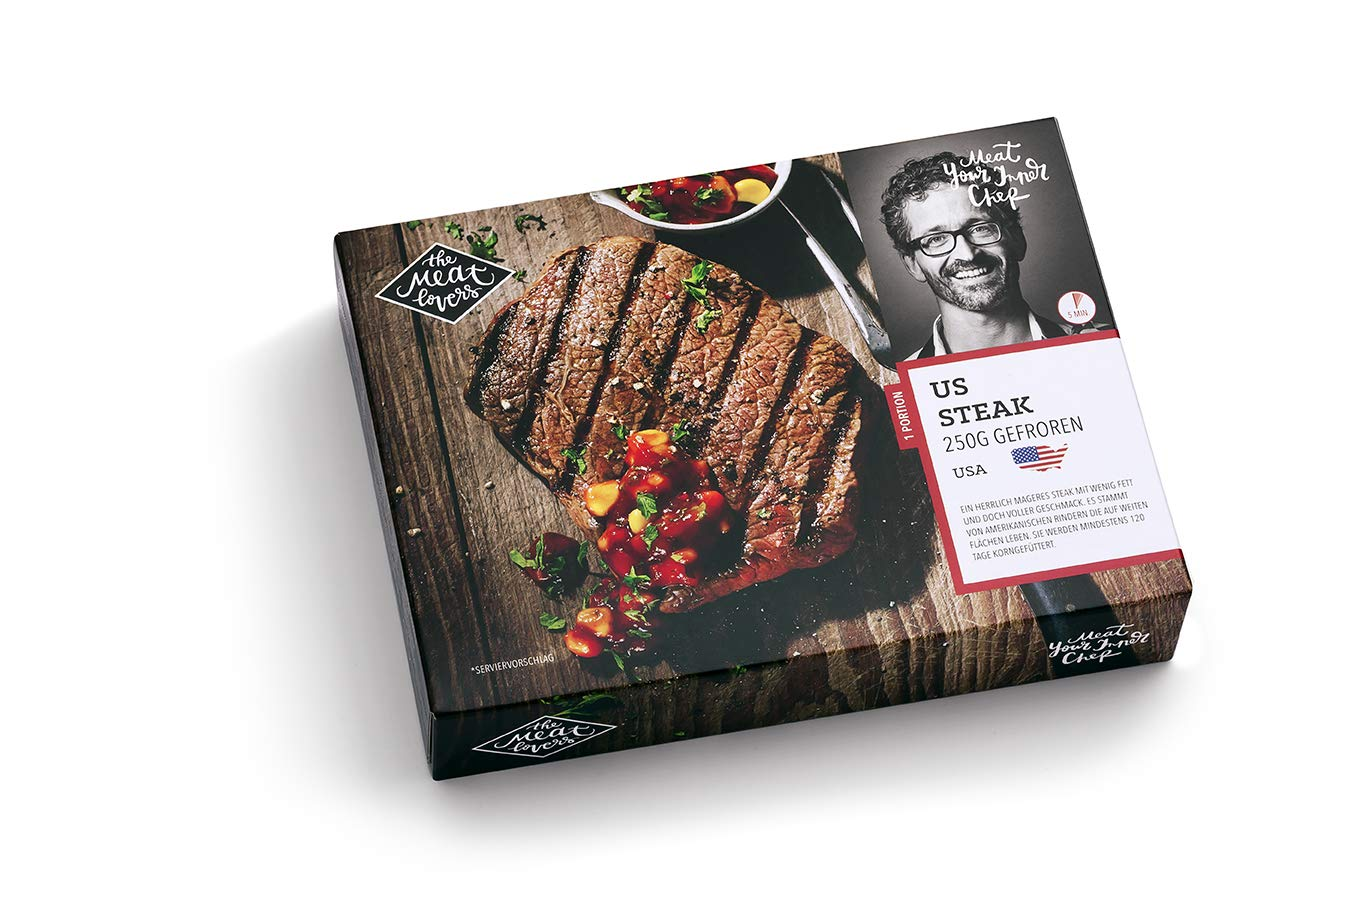 Amerikanischer Kühlschrank Flach : The meatlovers us steak 1 stück 250g tiefgefroren : amazon.de